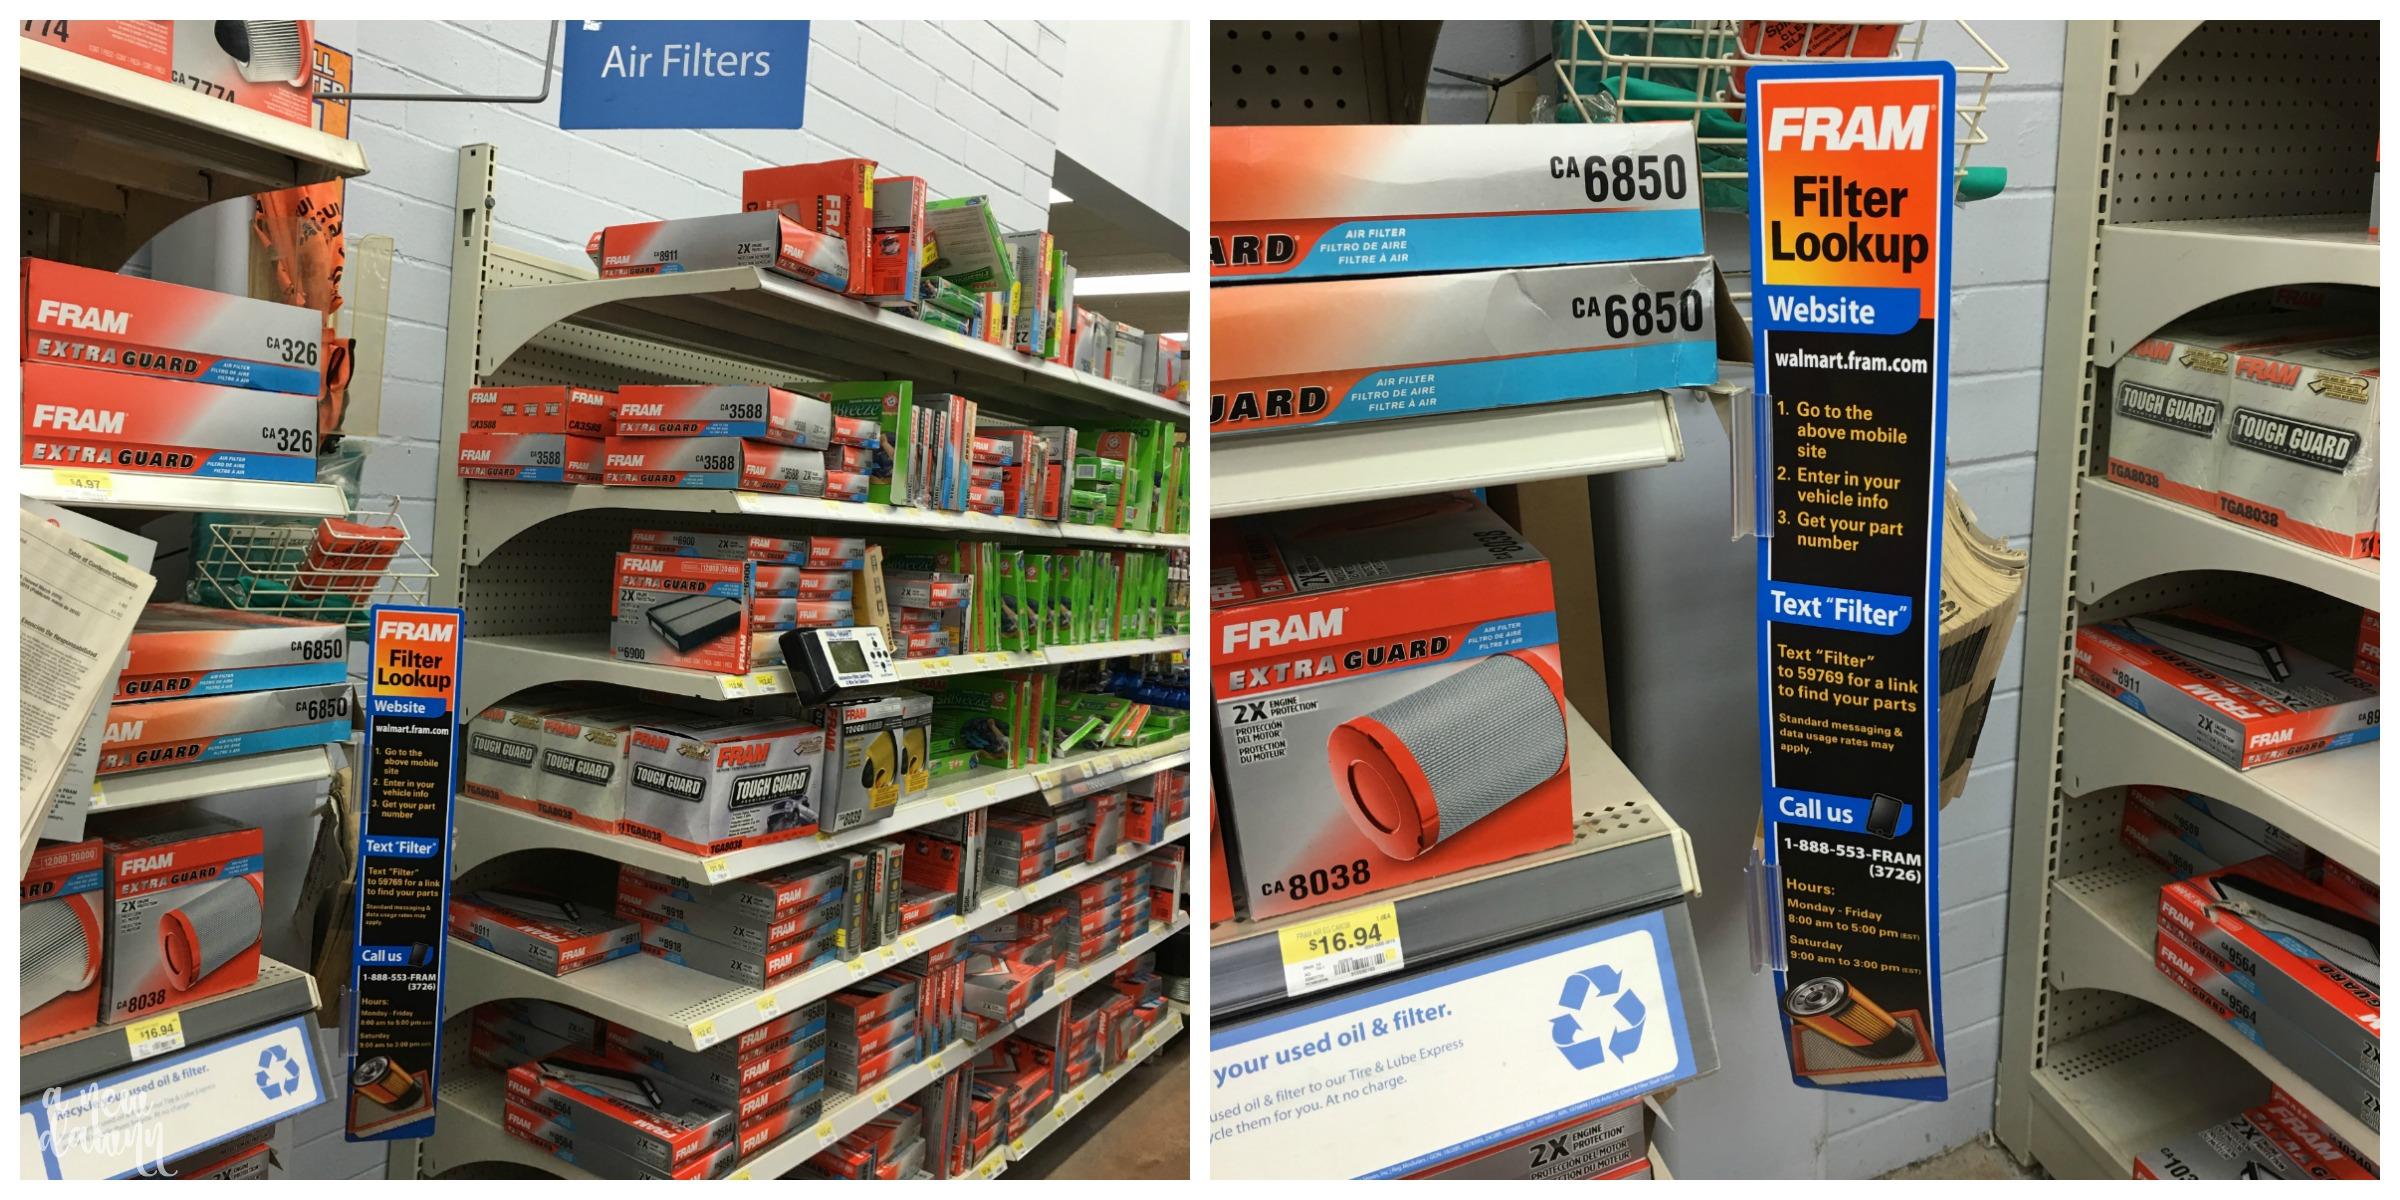 Fram-AIr-Filters-Walmart